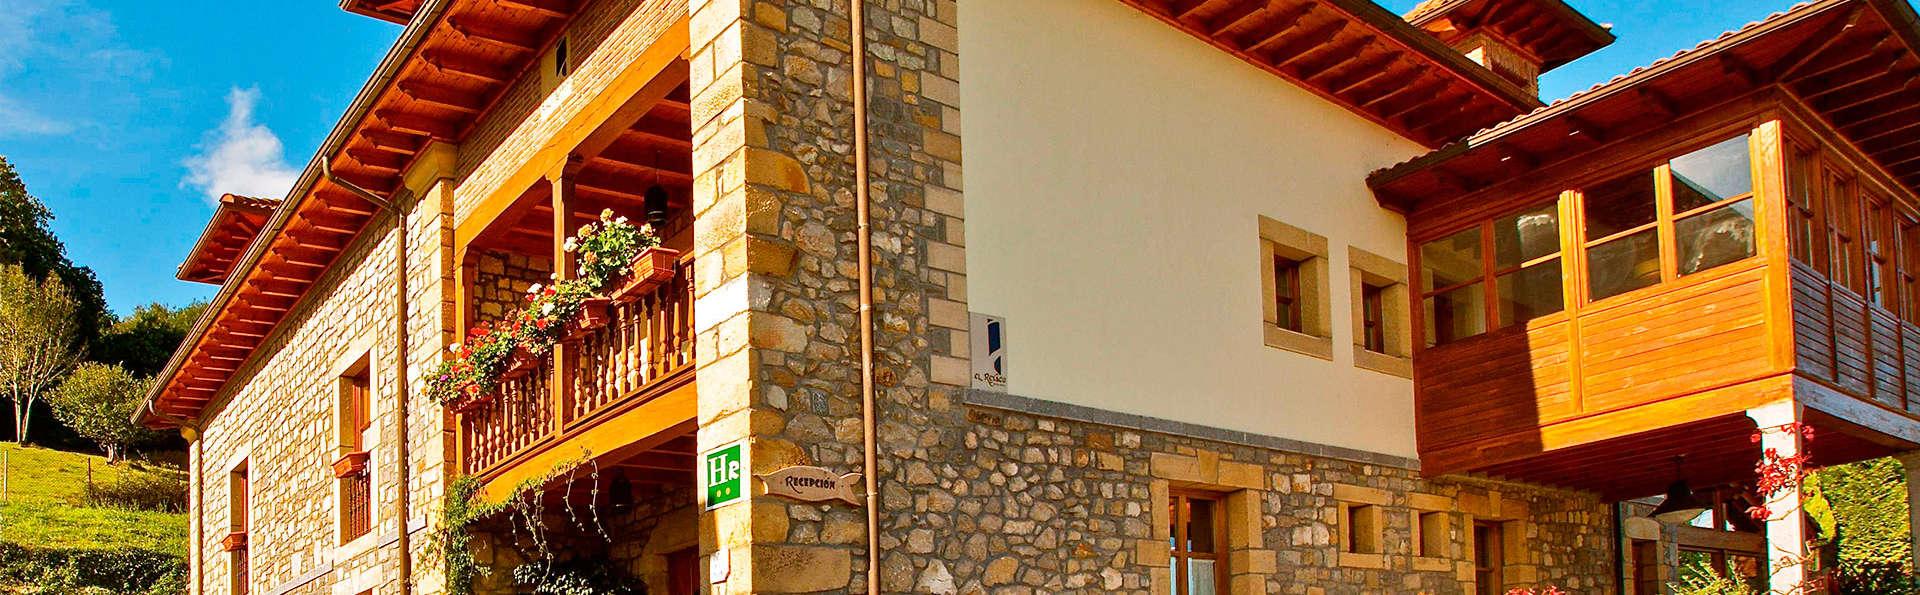 Hotel El Rexacu - EDIT_front1.jpg